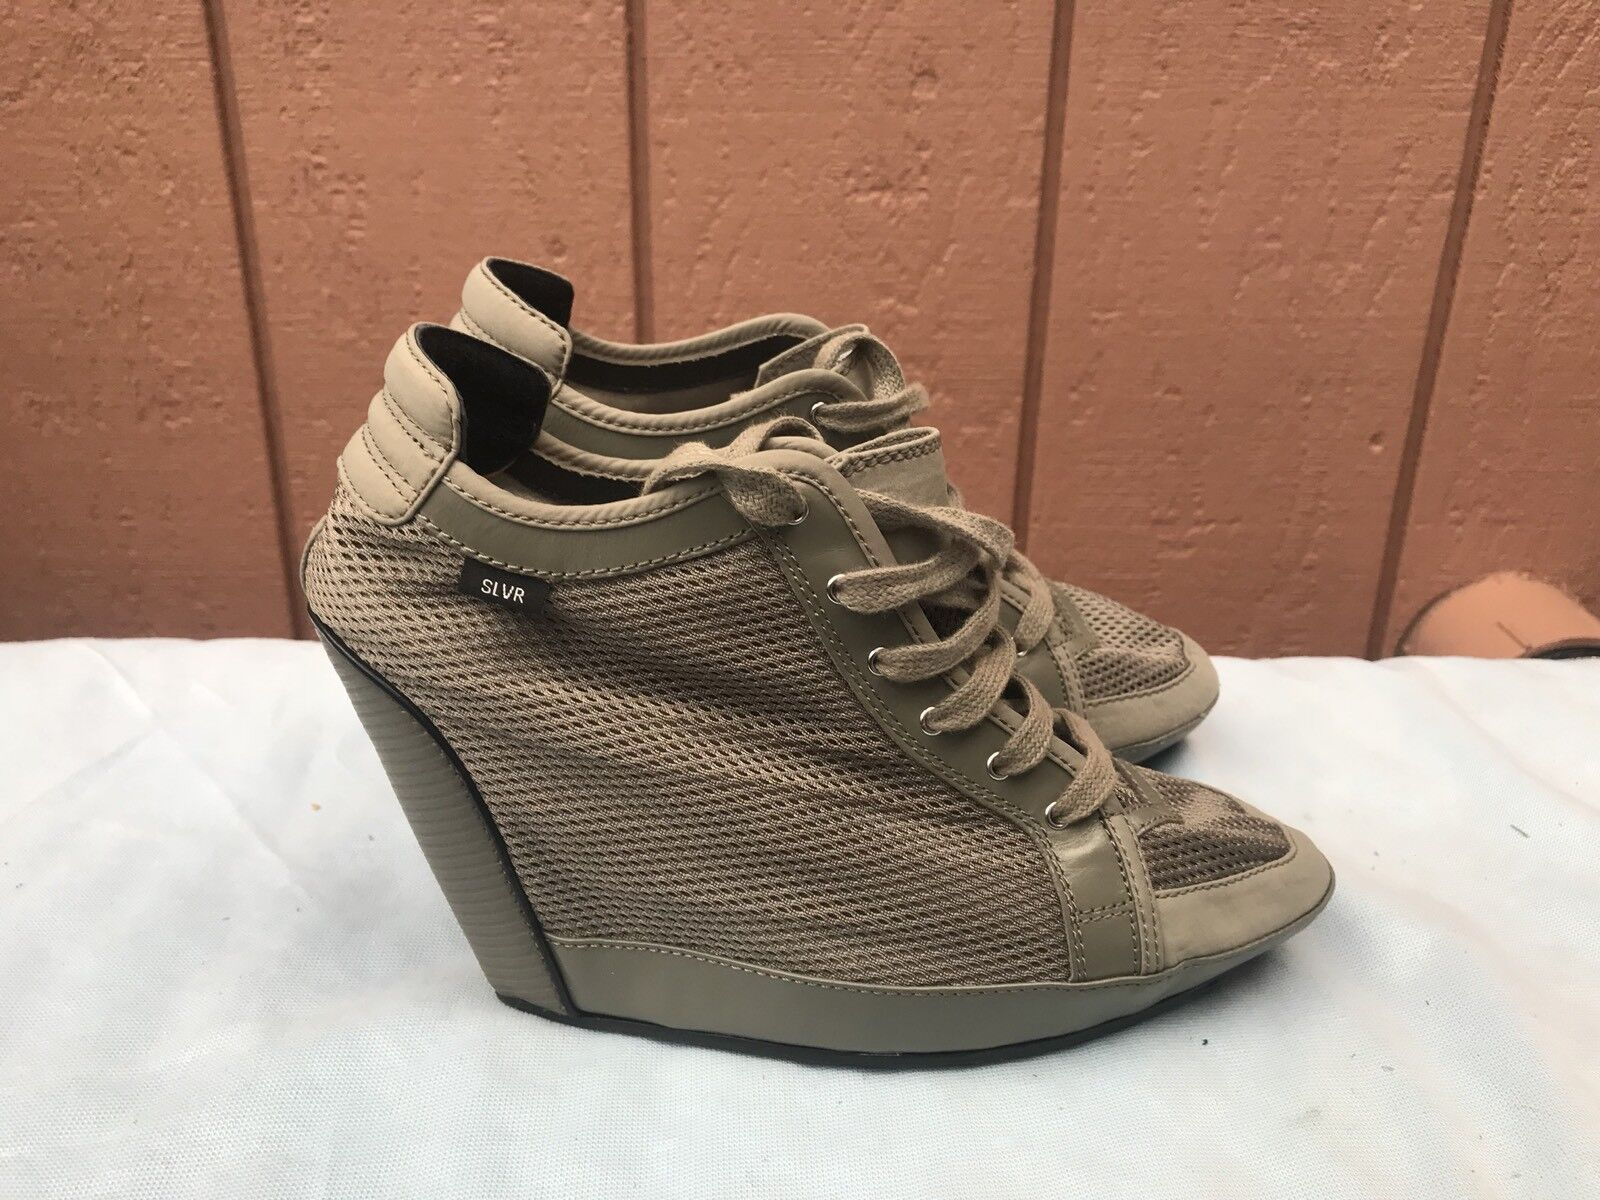 neue adidas größe slvr olivgrün - keil mesh schuhe größe adidas 7 / 3) 7bc2f0